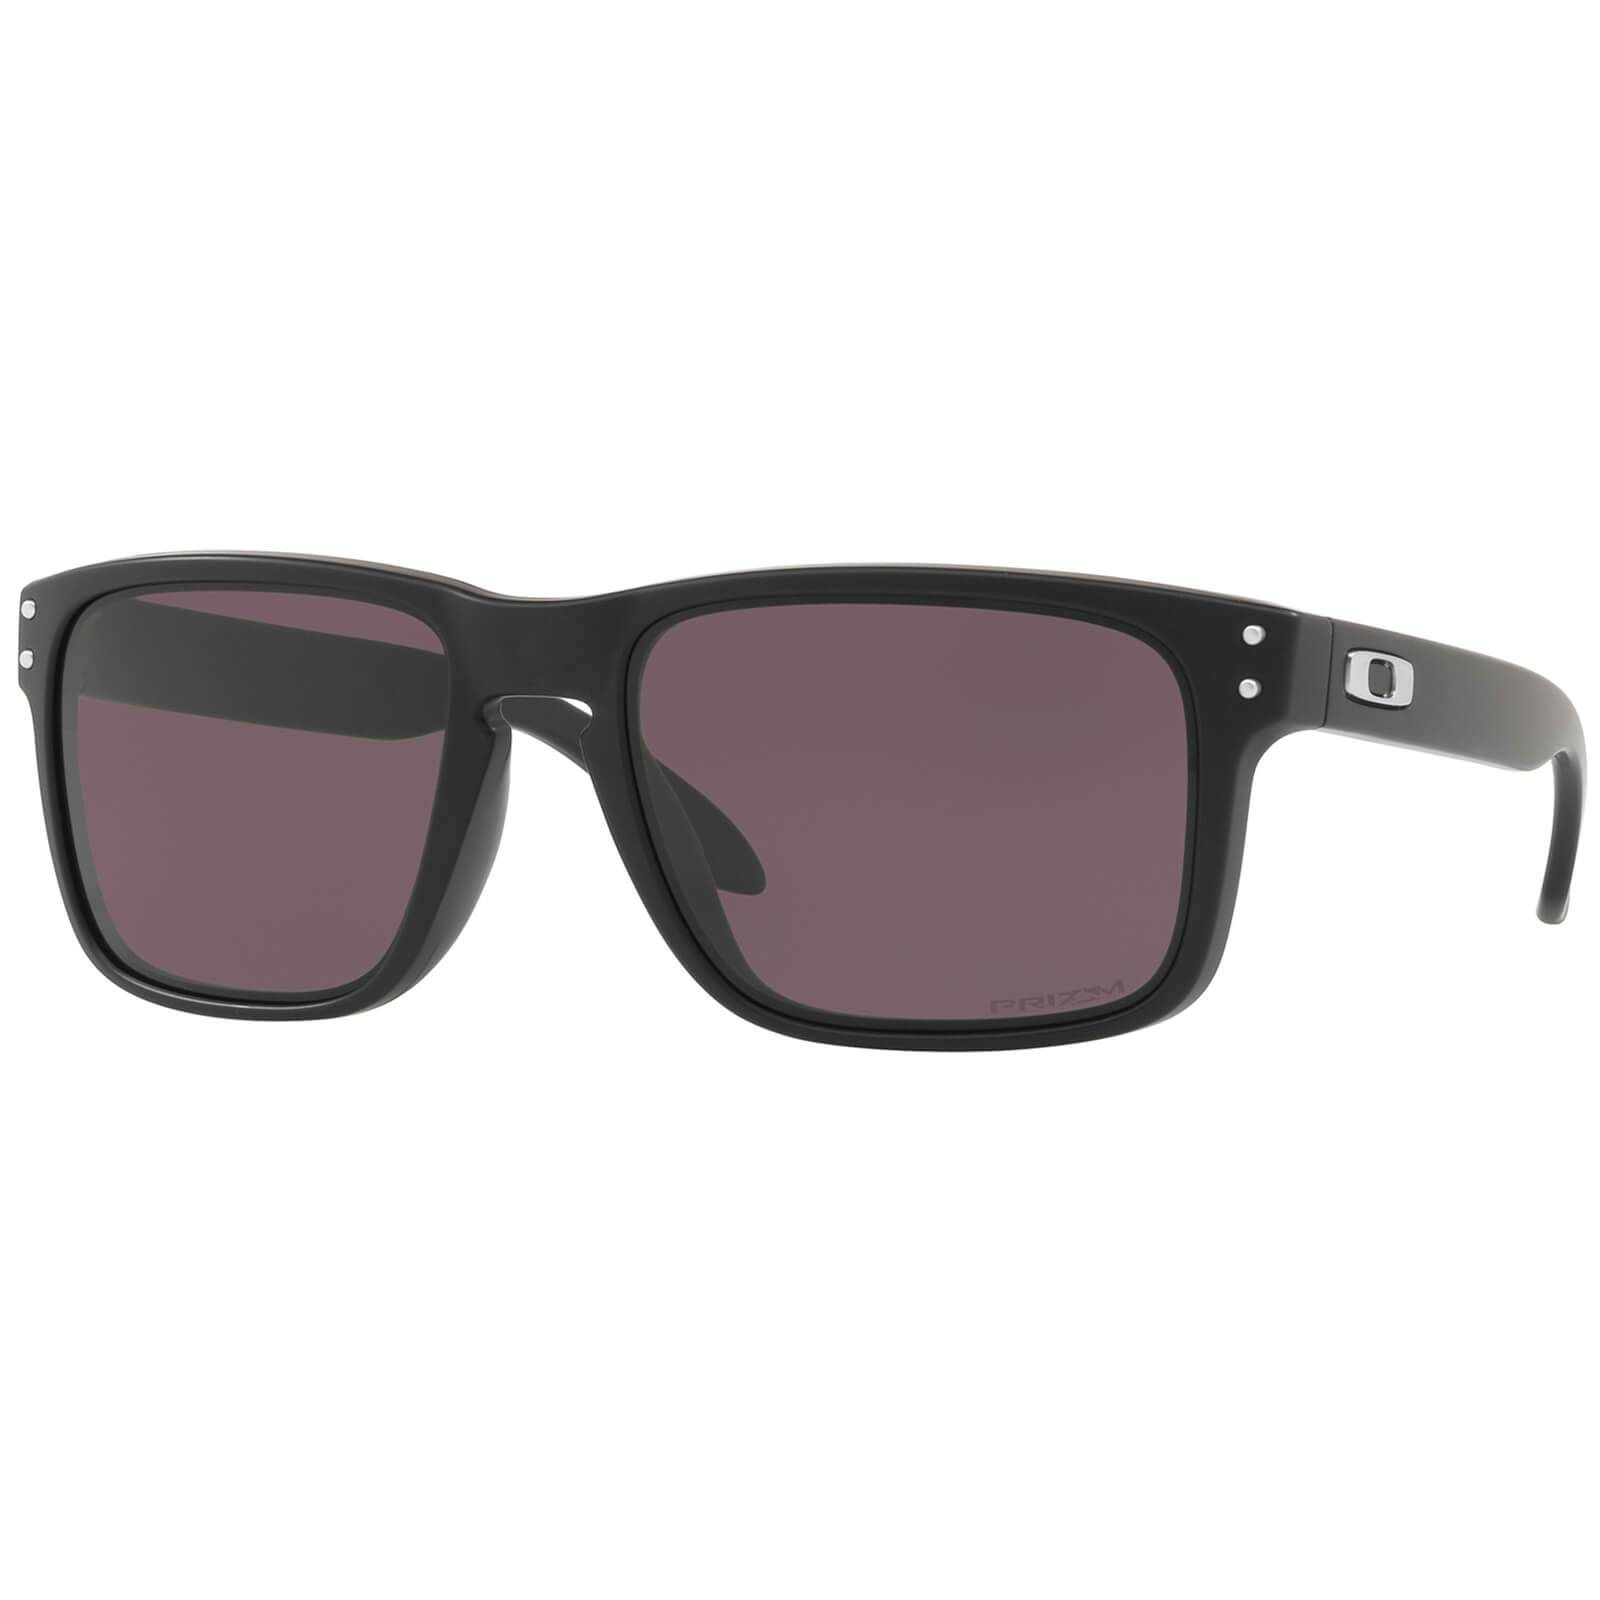 Oakley Holbrook Sunglasses - Matte Black/Prizm Grey